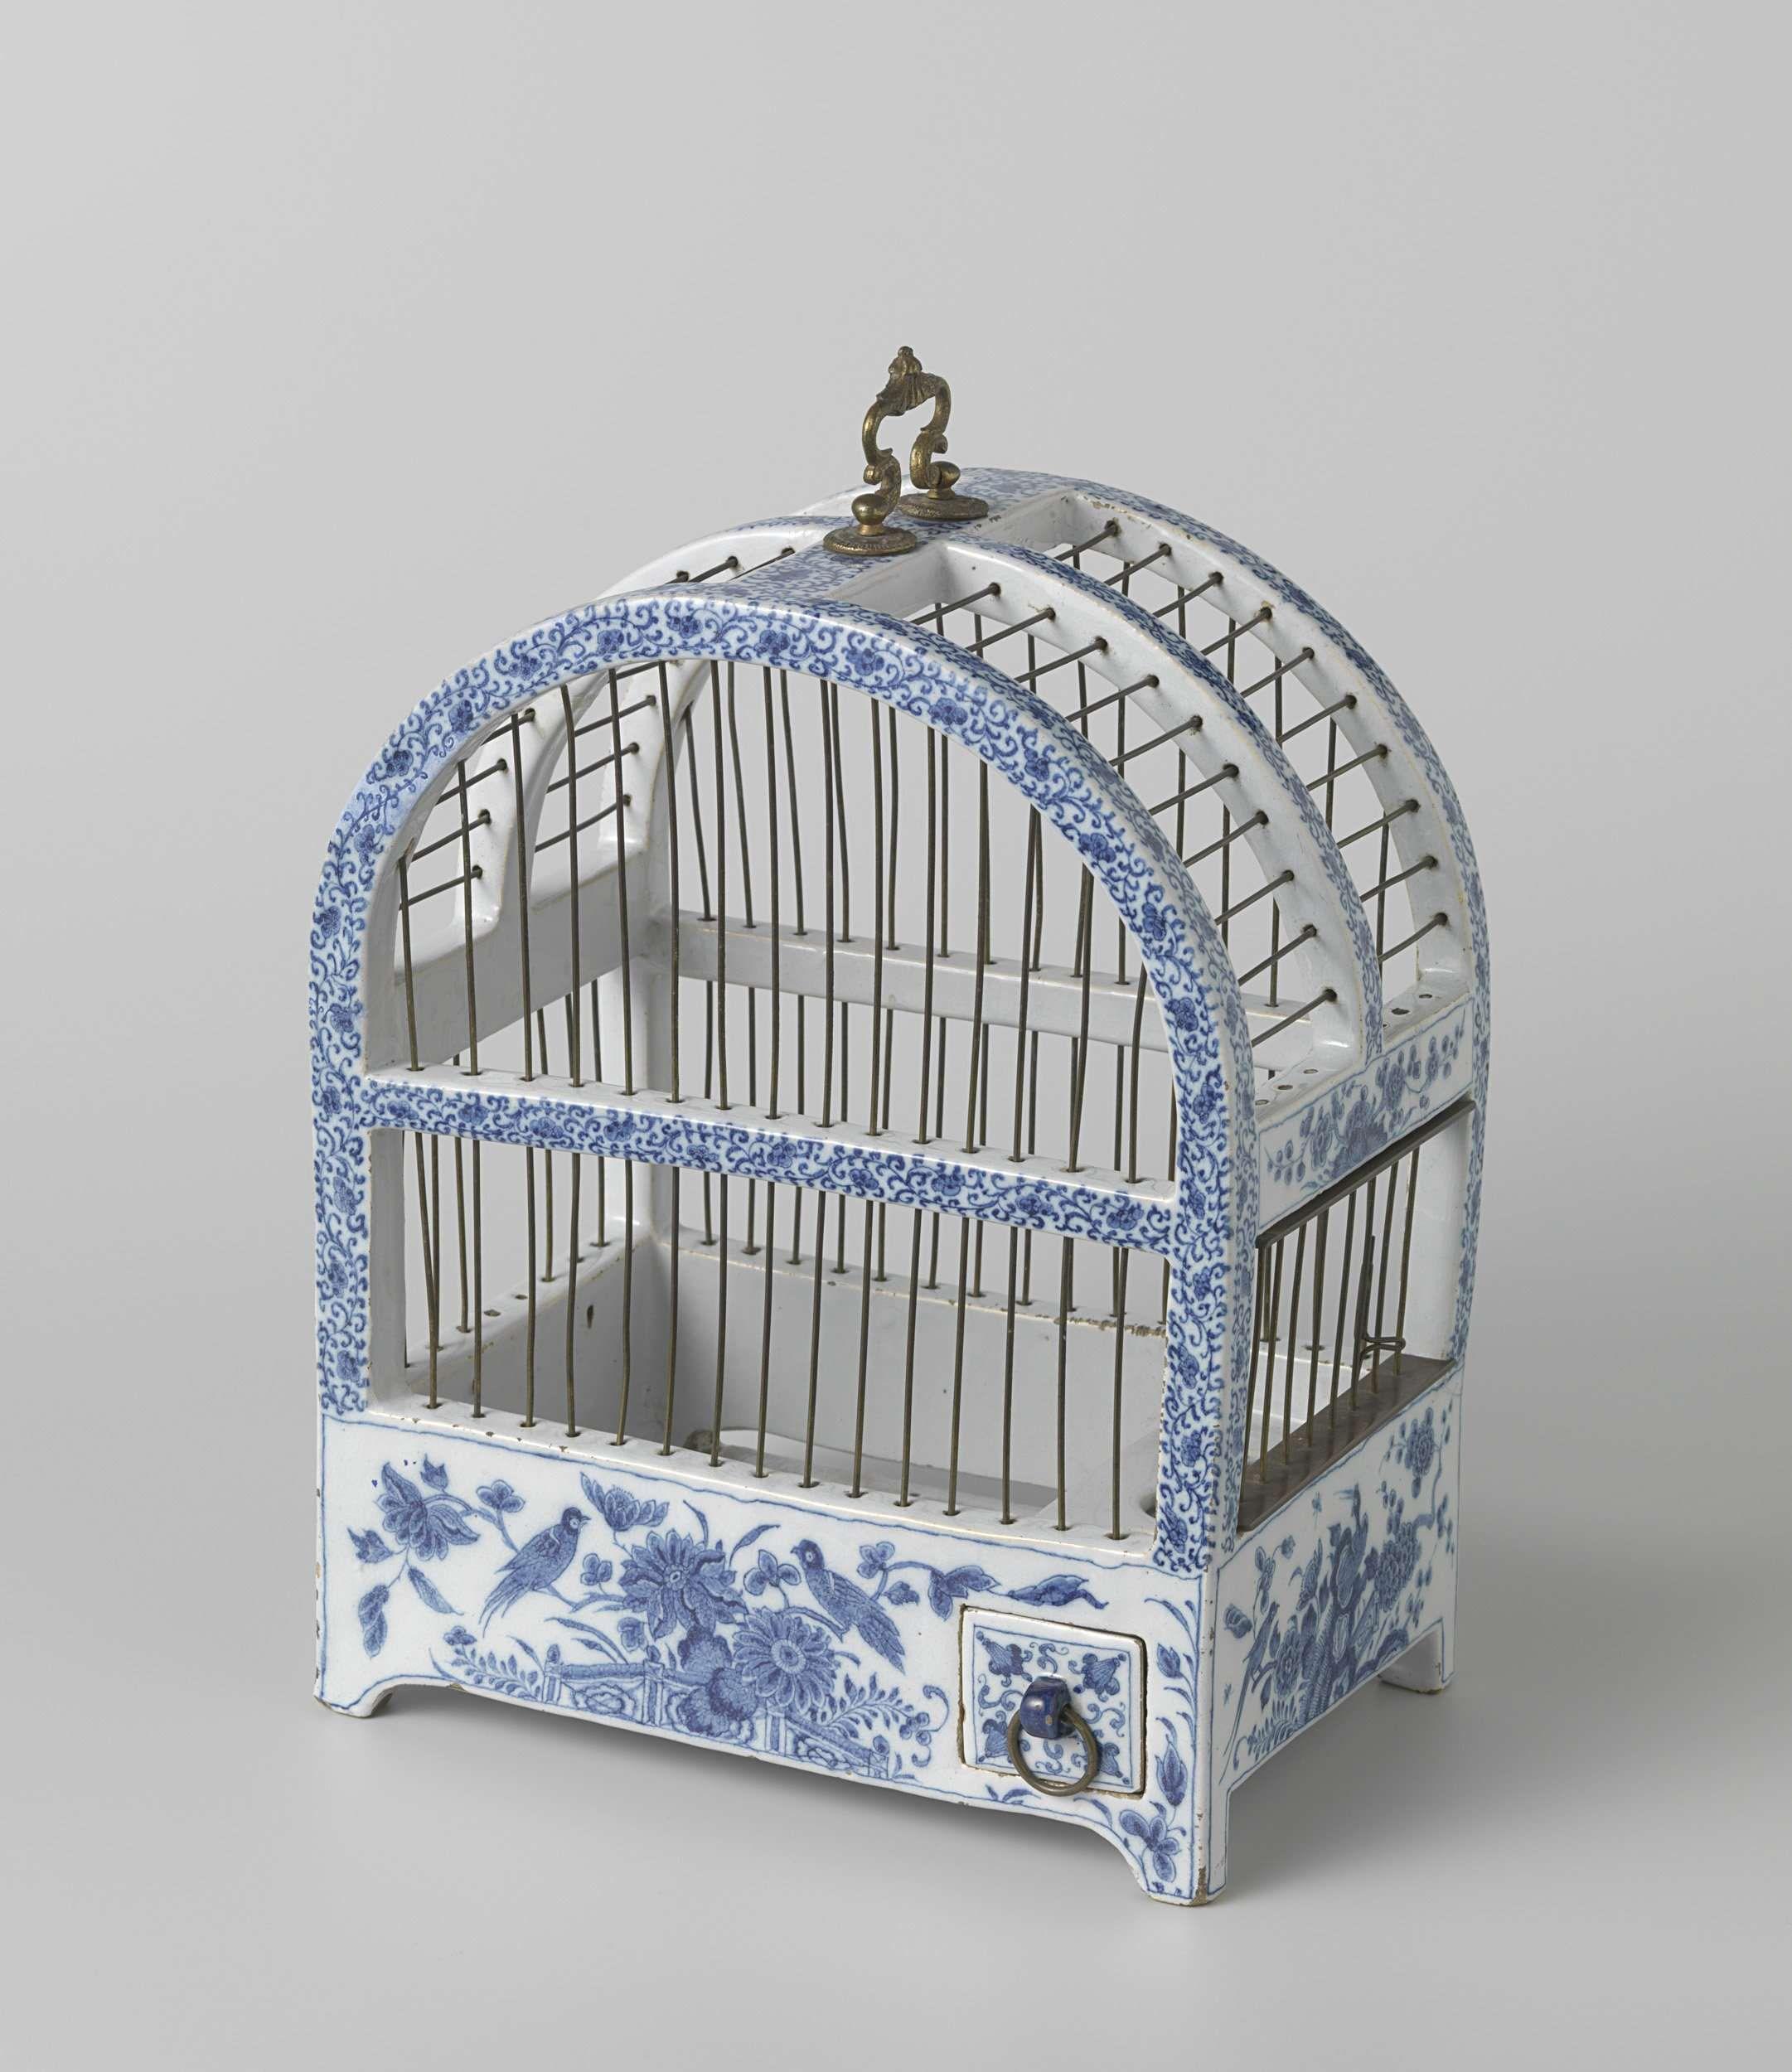 Birdcage, anoniem, c. 1685 - c. 1700